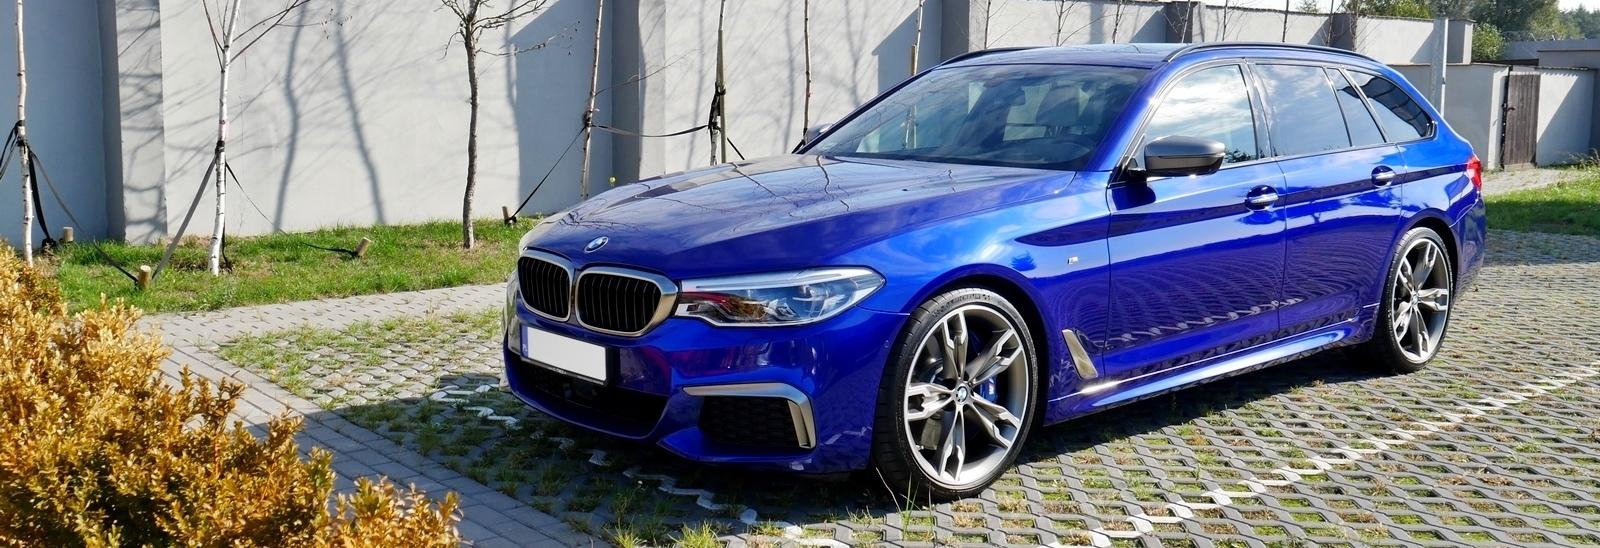 BMW 5 G31 Maxhaust